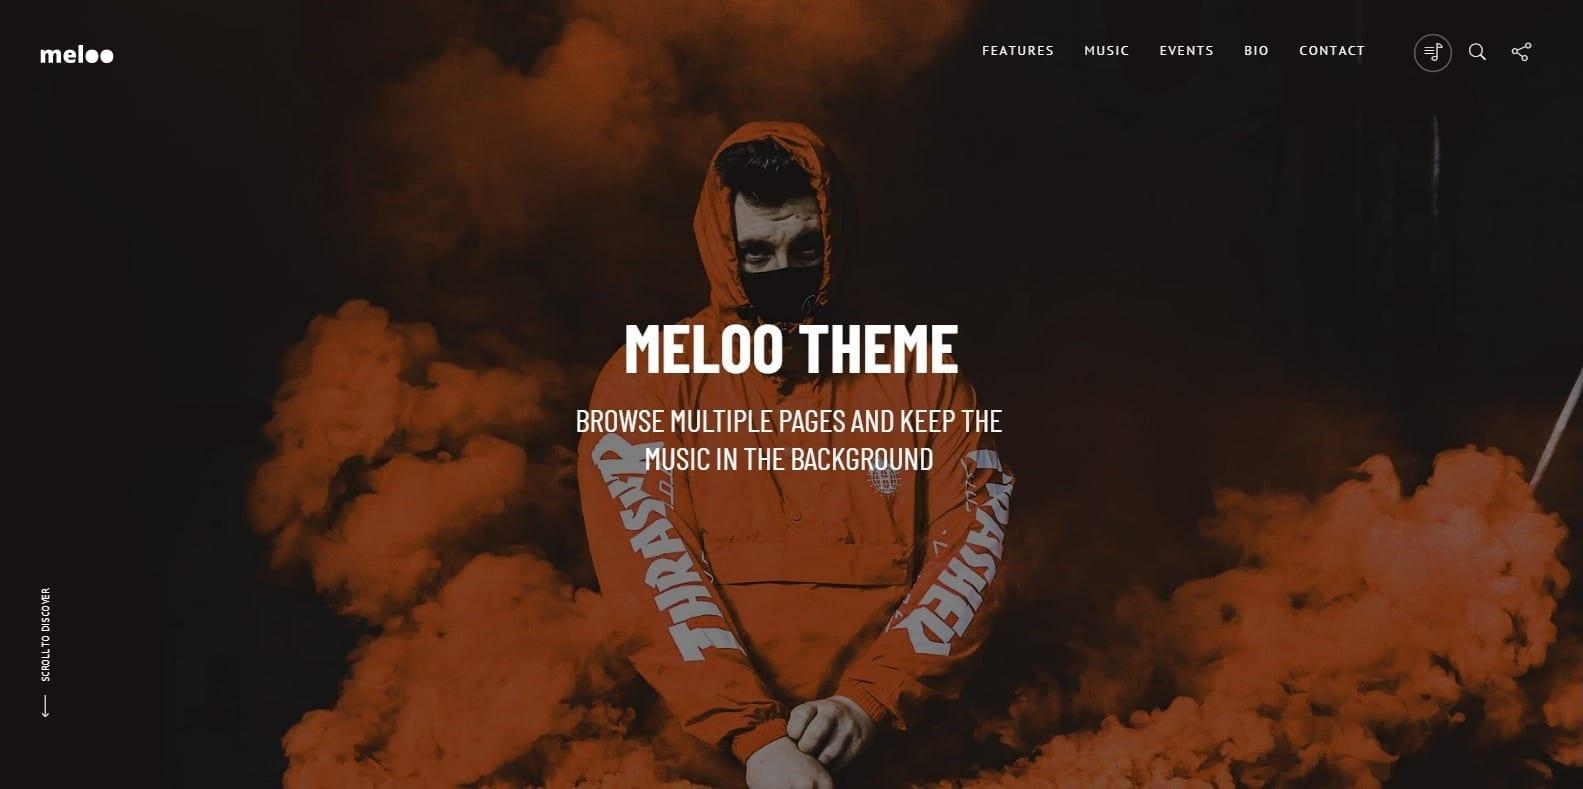 meloo-dj-website-template